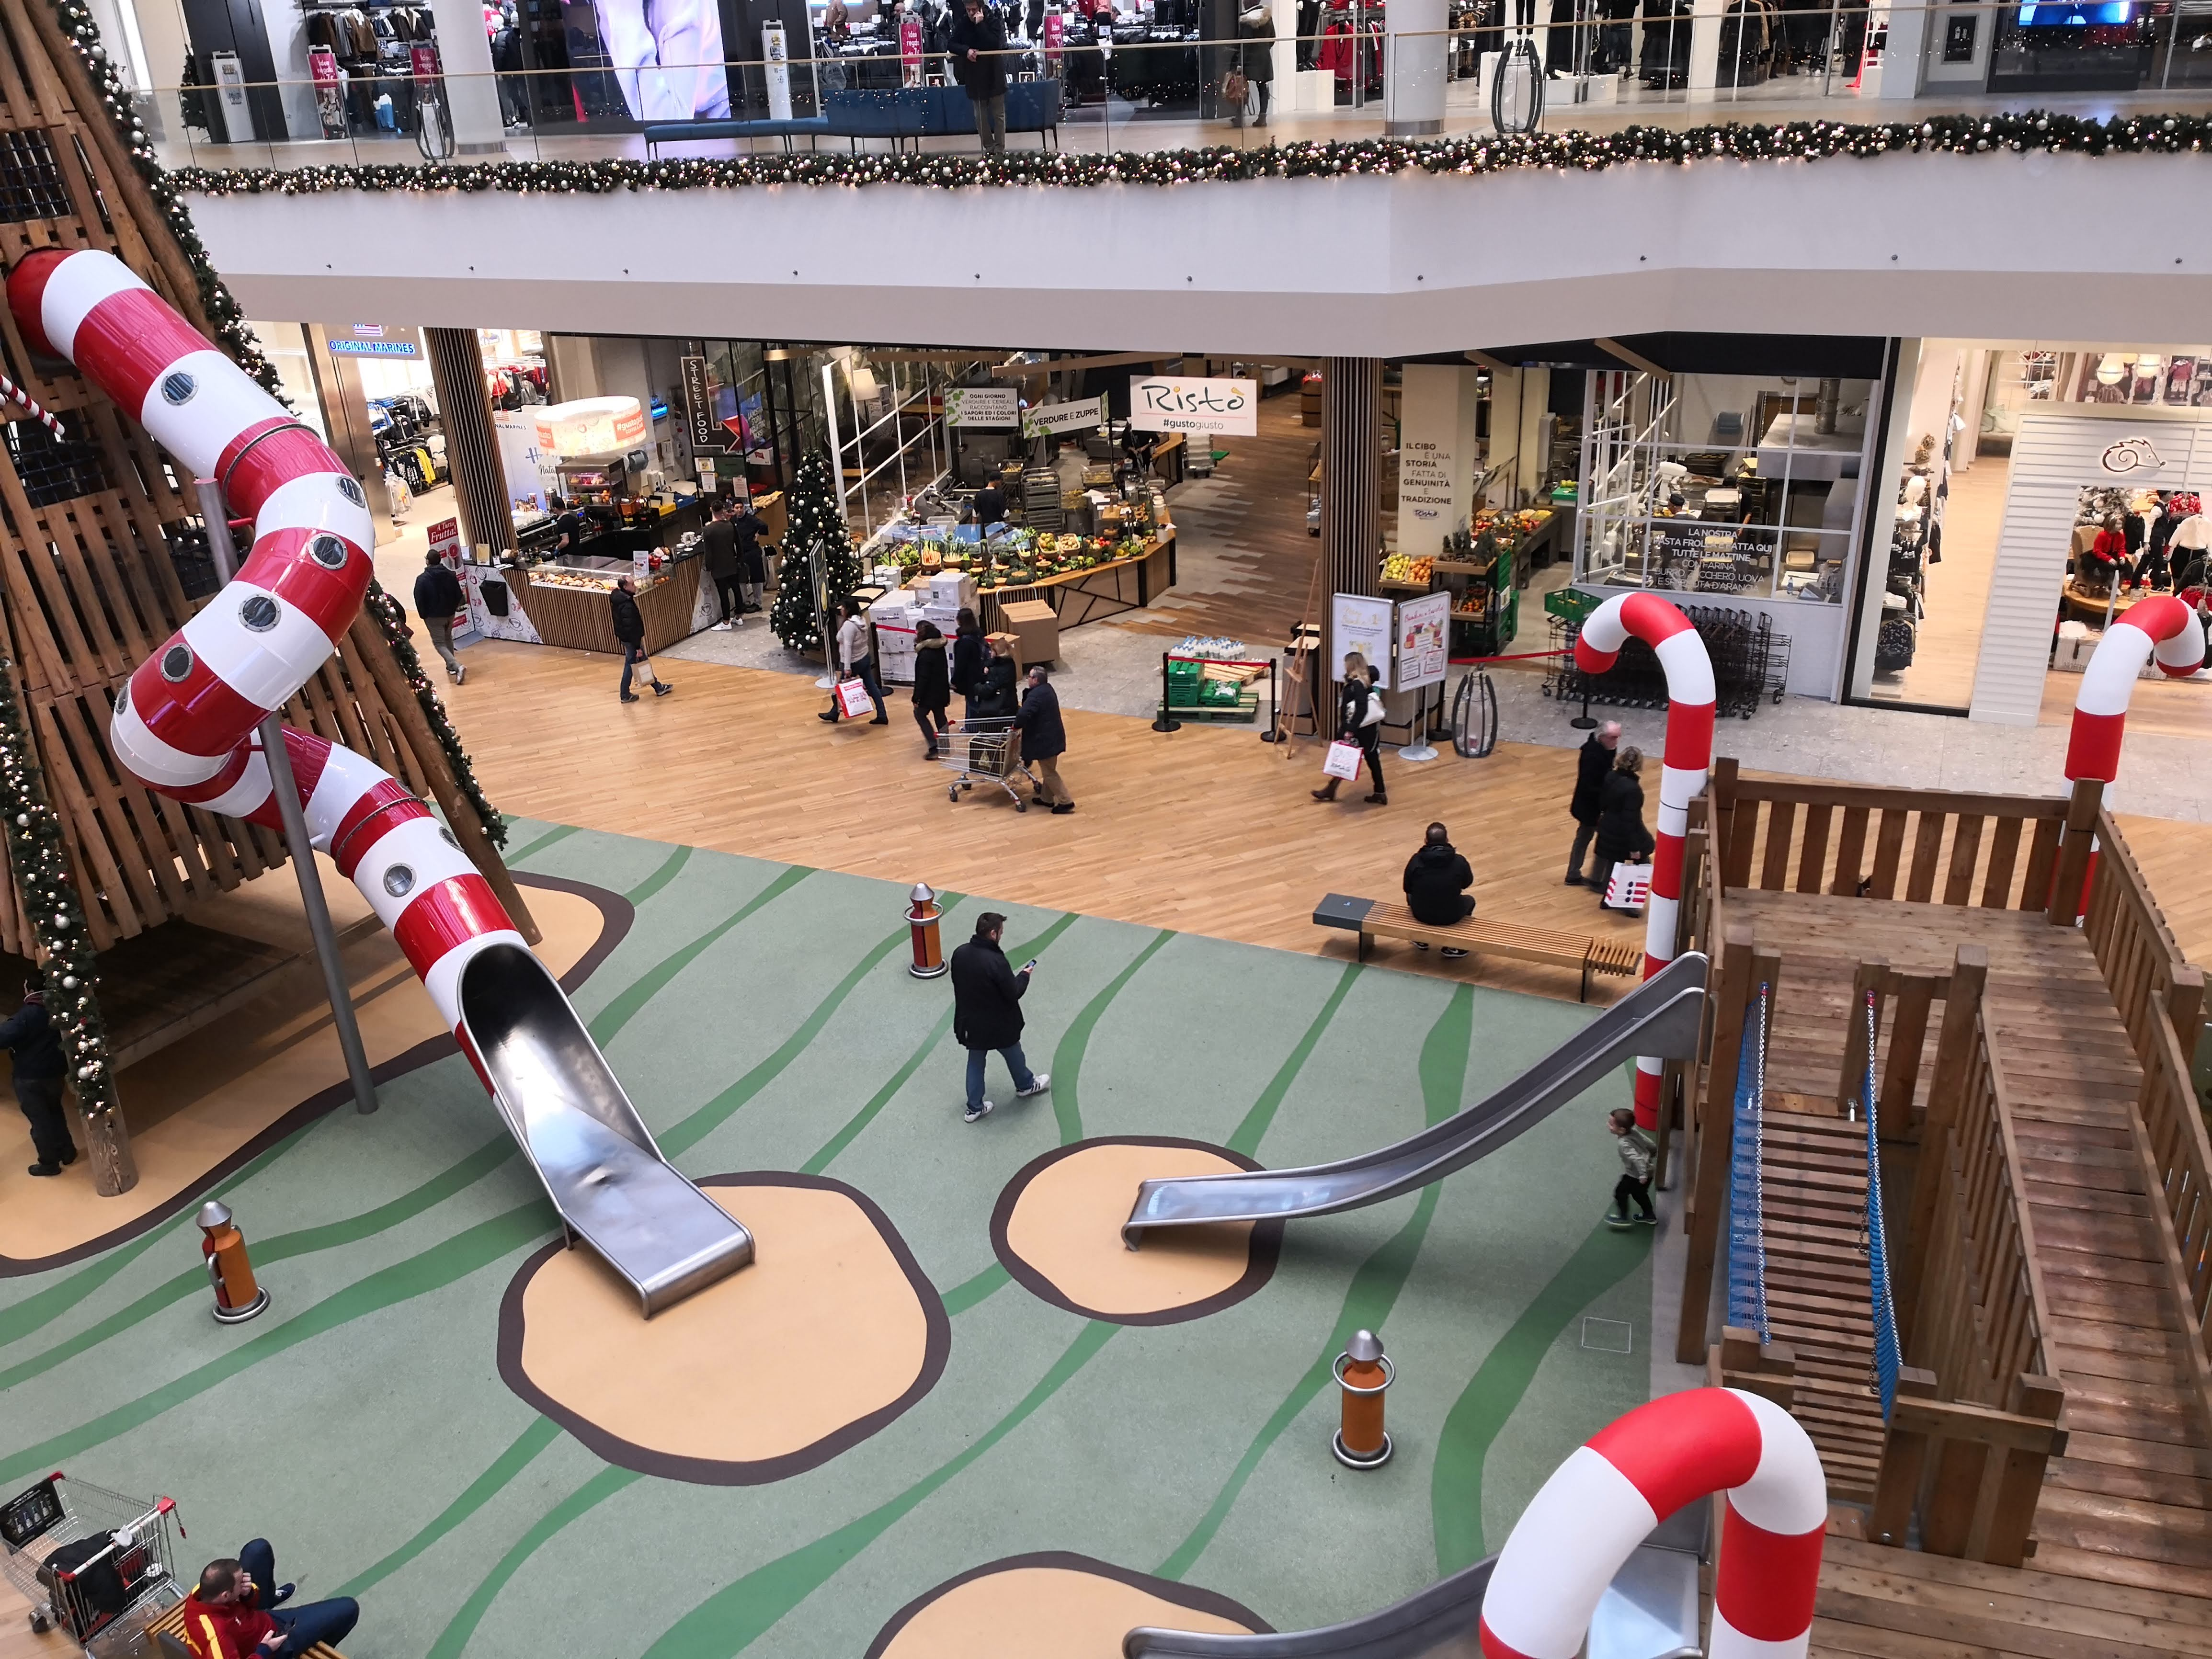 pavimentazione antitrauma centro commerciale indoor